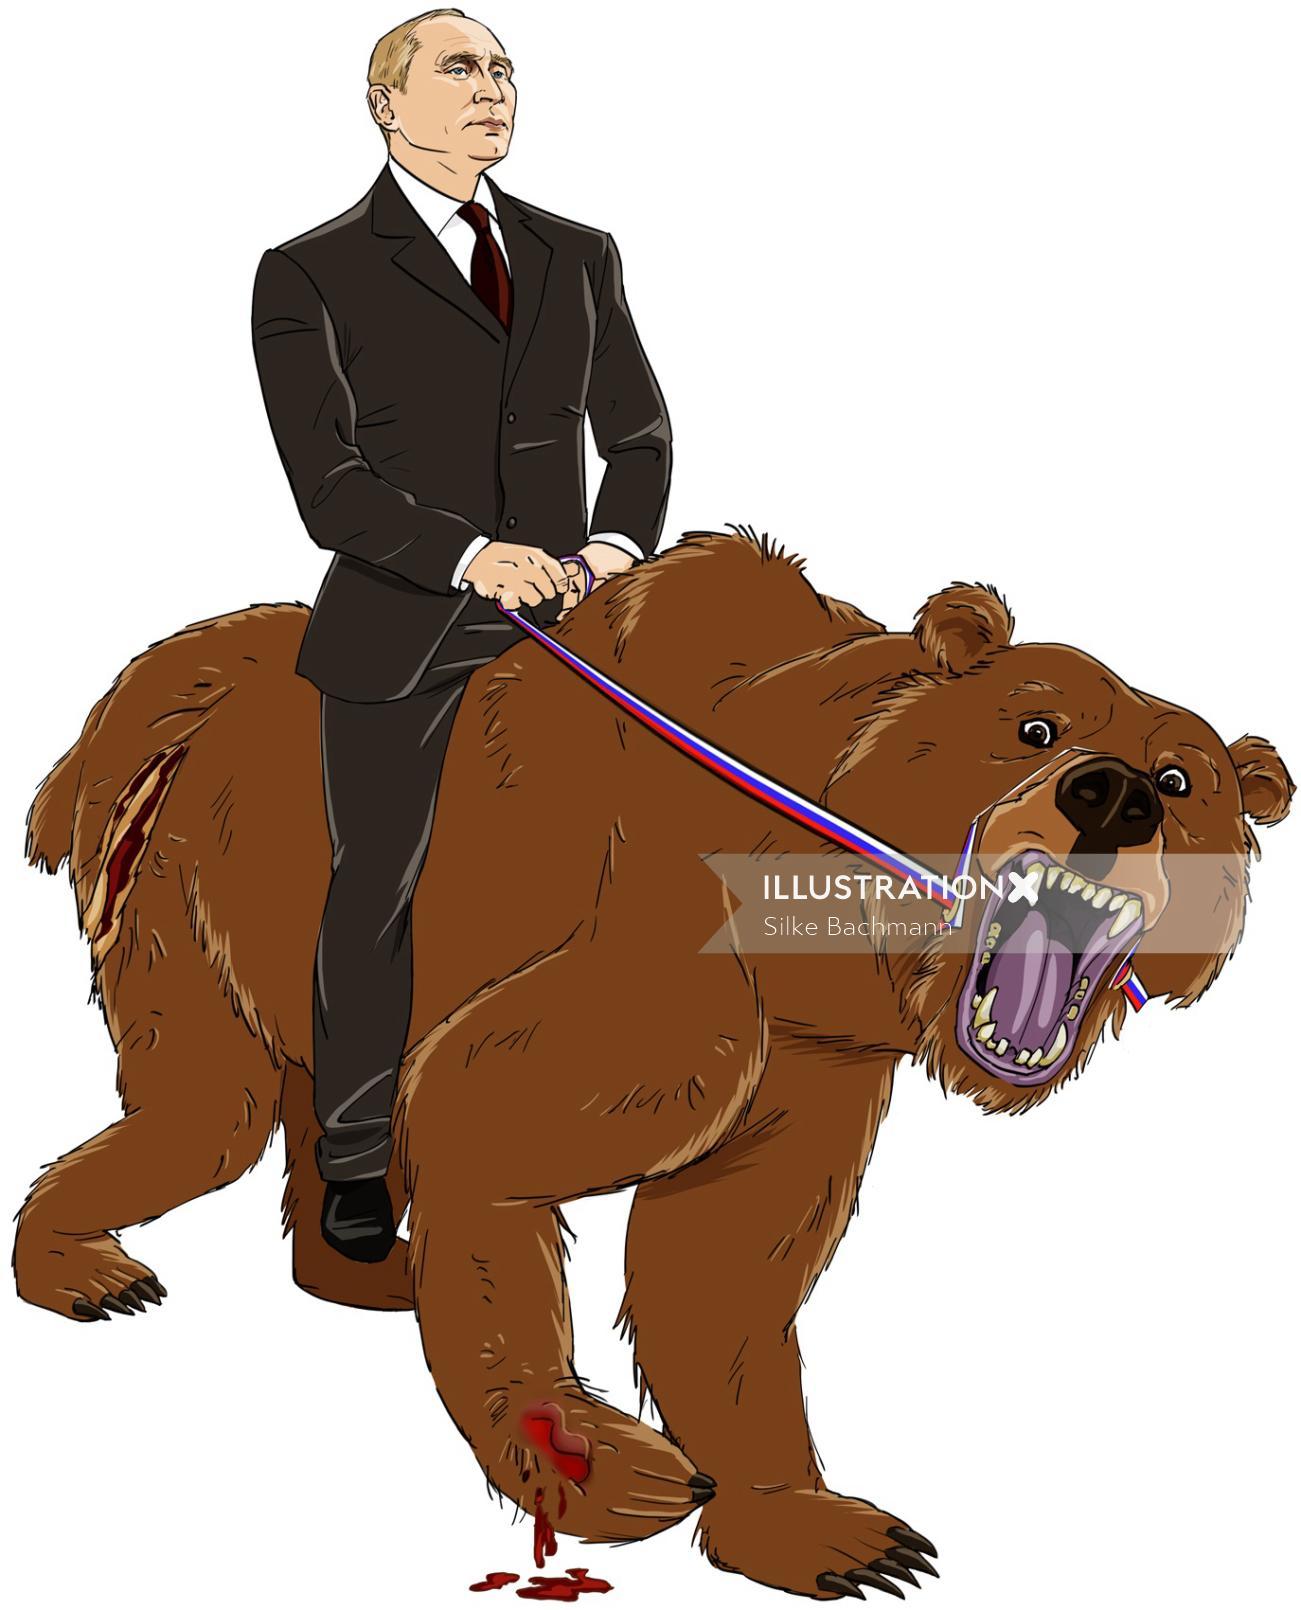 Putin riding a wolf illustration